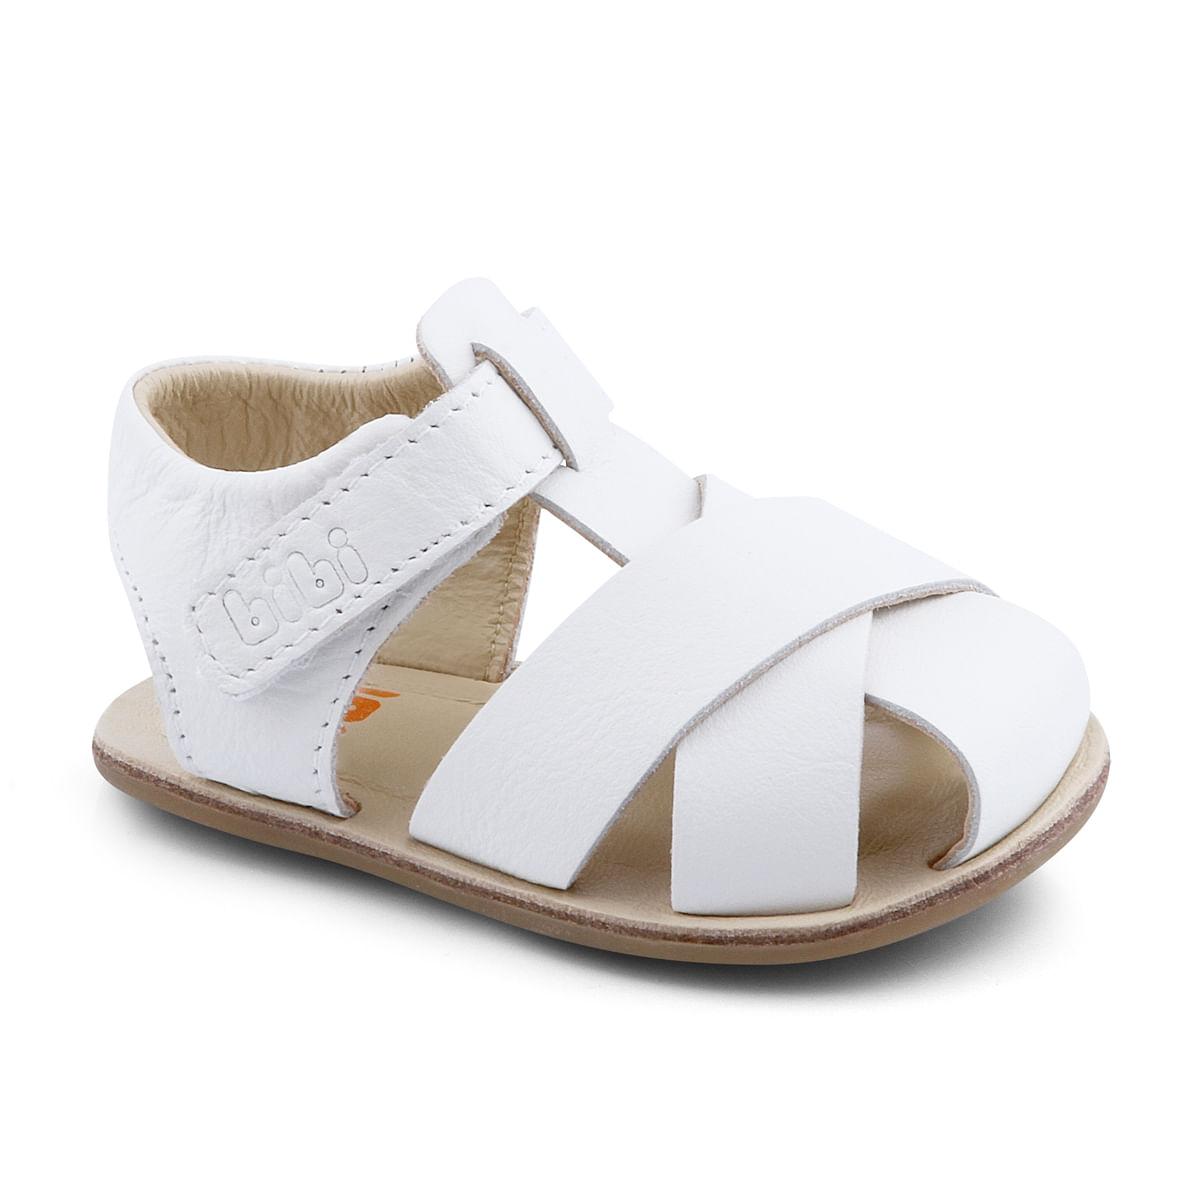 44596f61d989b Sandália Infantil Bibi Masculina Branca Afeto 1007010 - Bibi Calçados